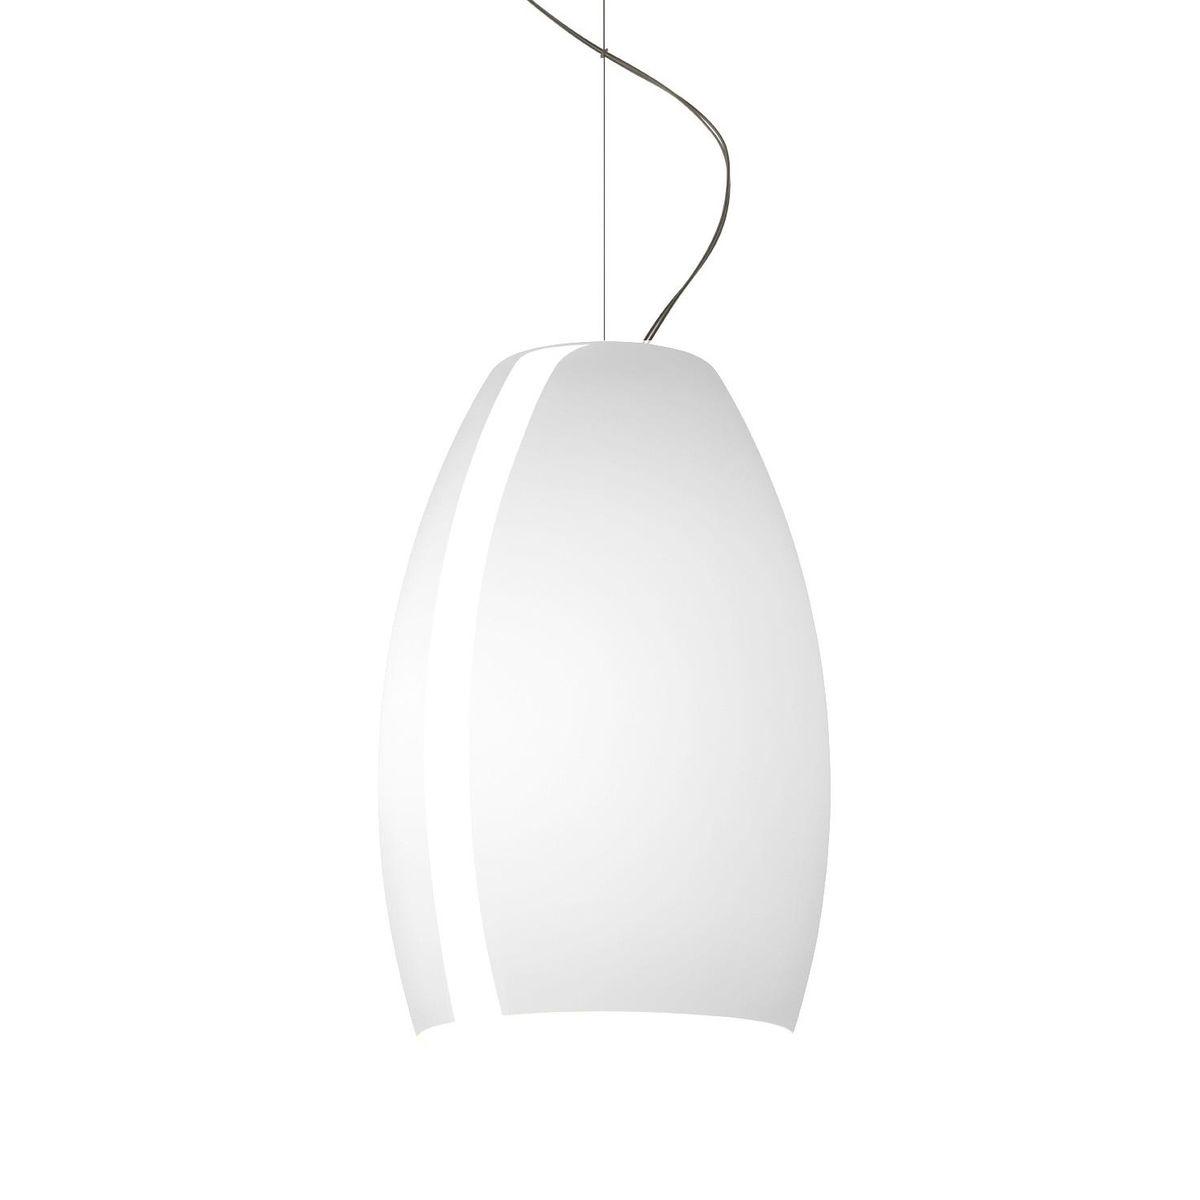 Buds 1 Lámpara colgante sin florón cable 5 metros E27 1x23W Blanco cálido